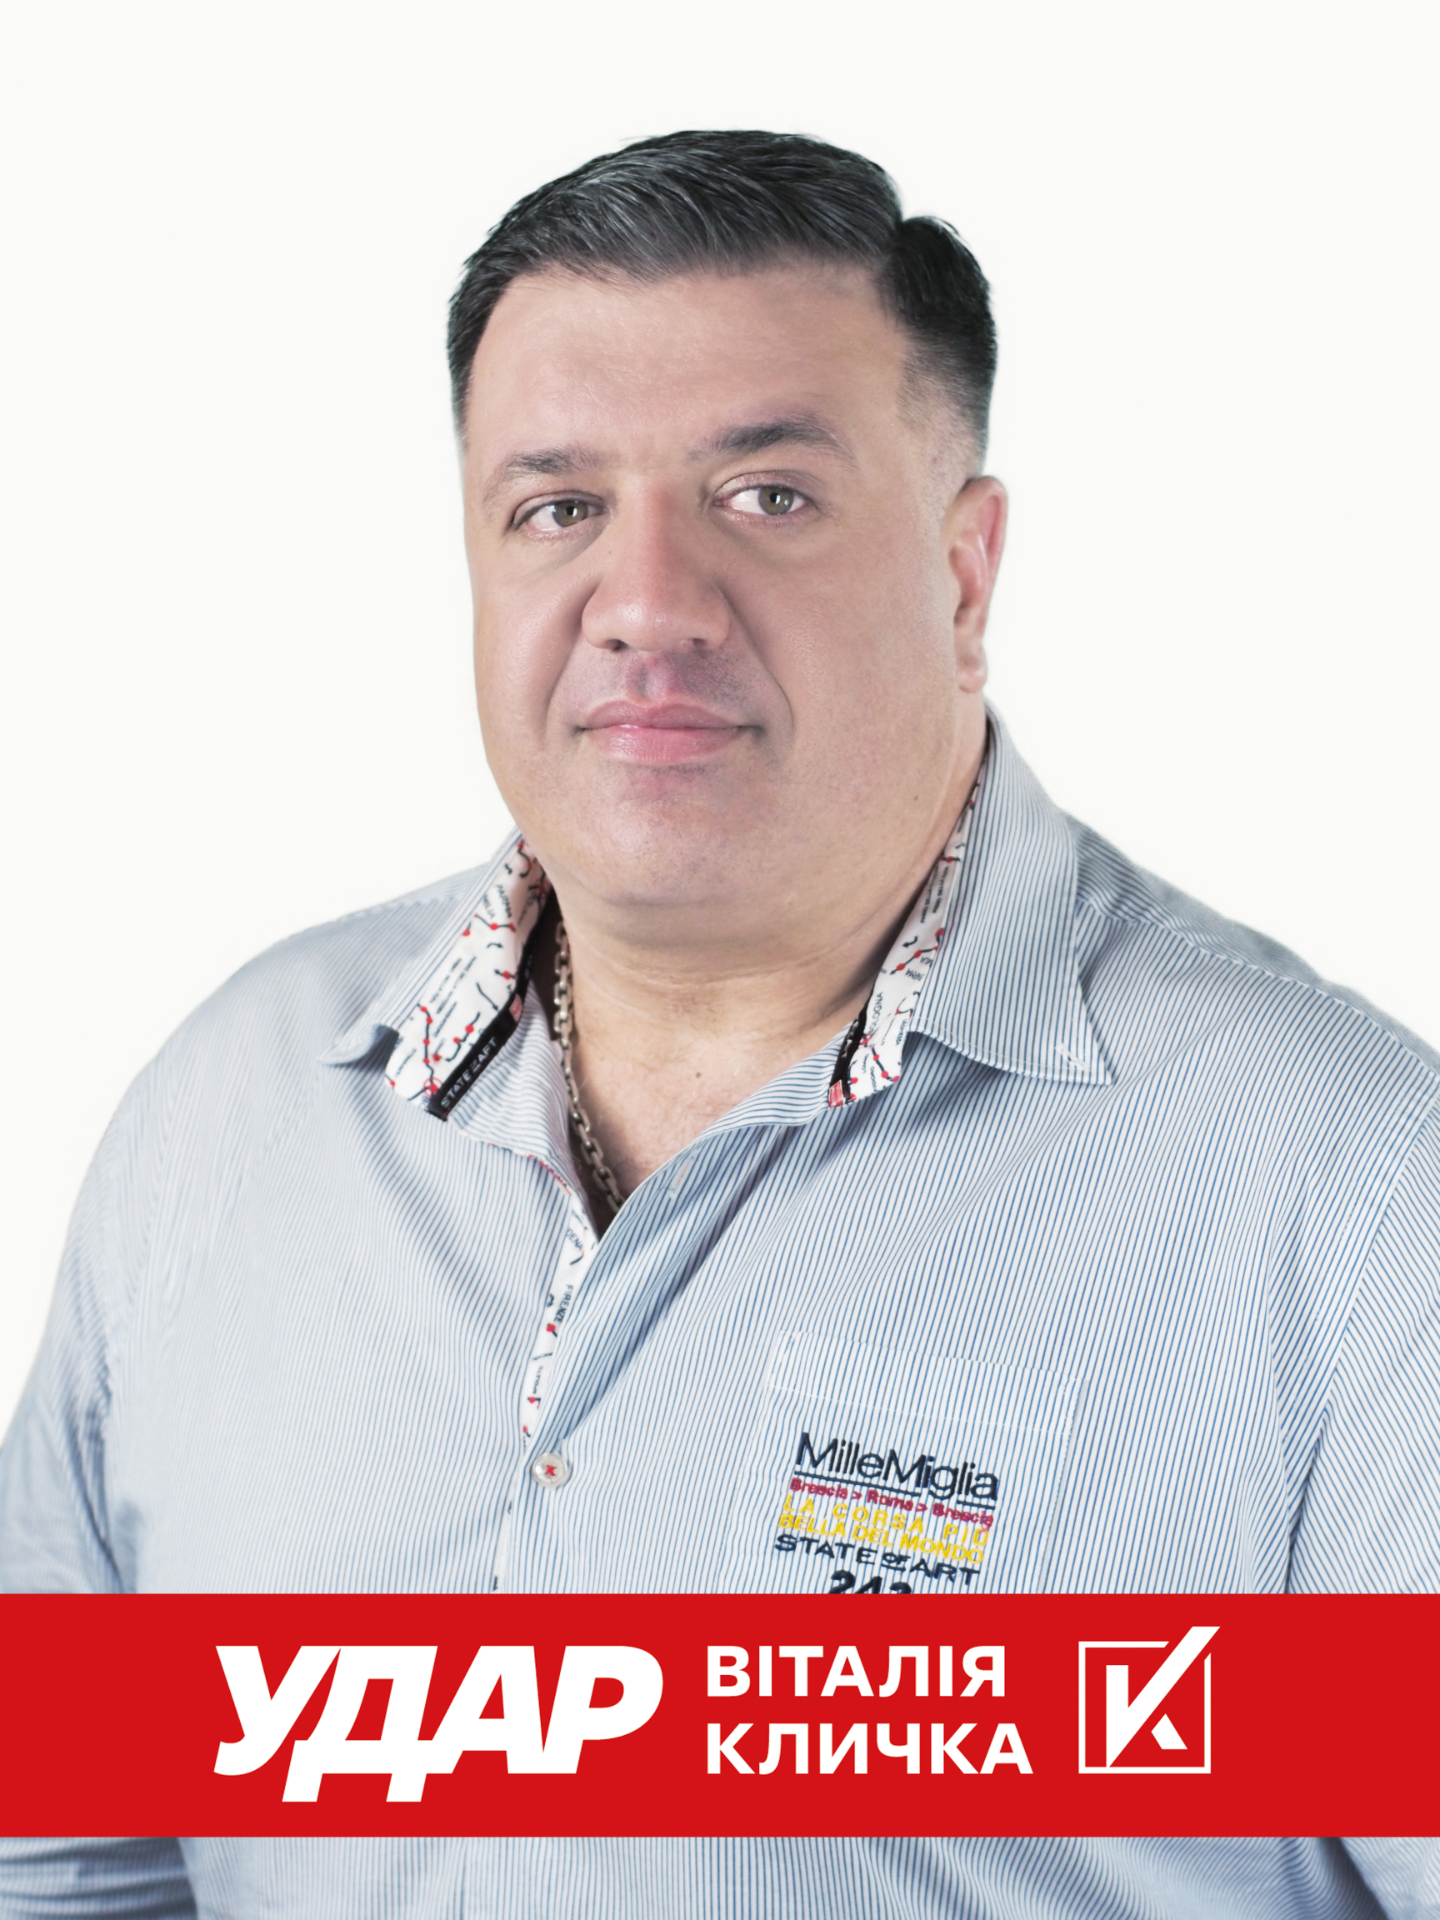 Томаш Богдан Володимирович